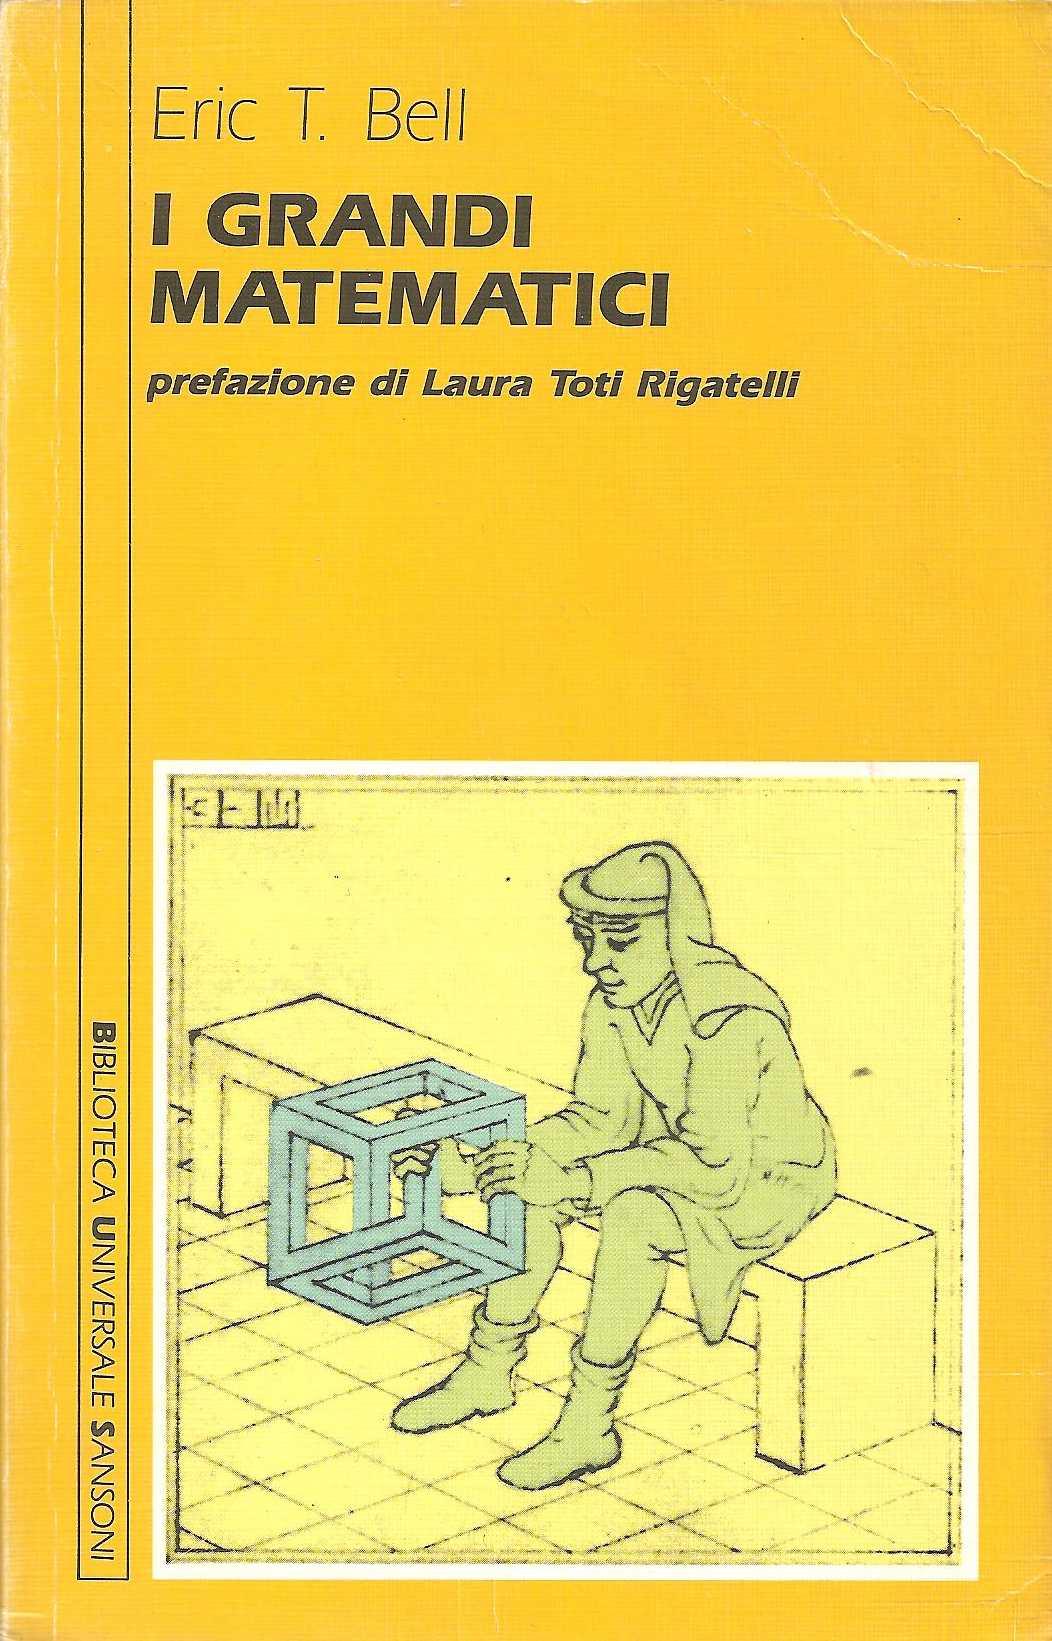 I grandi matematici